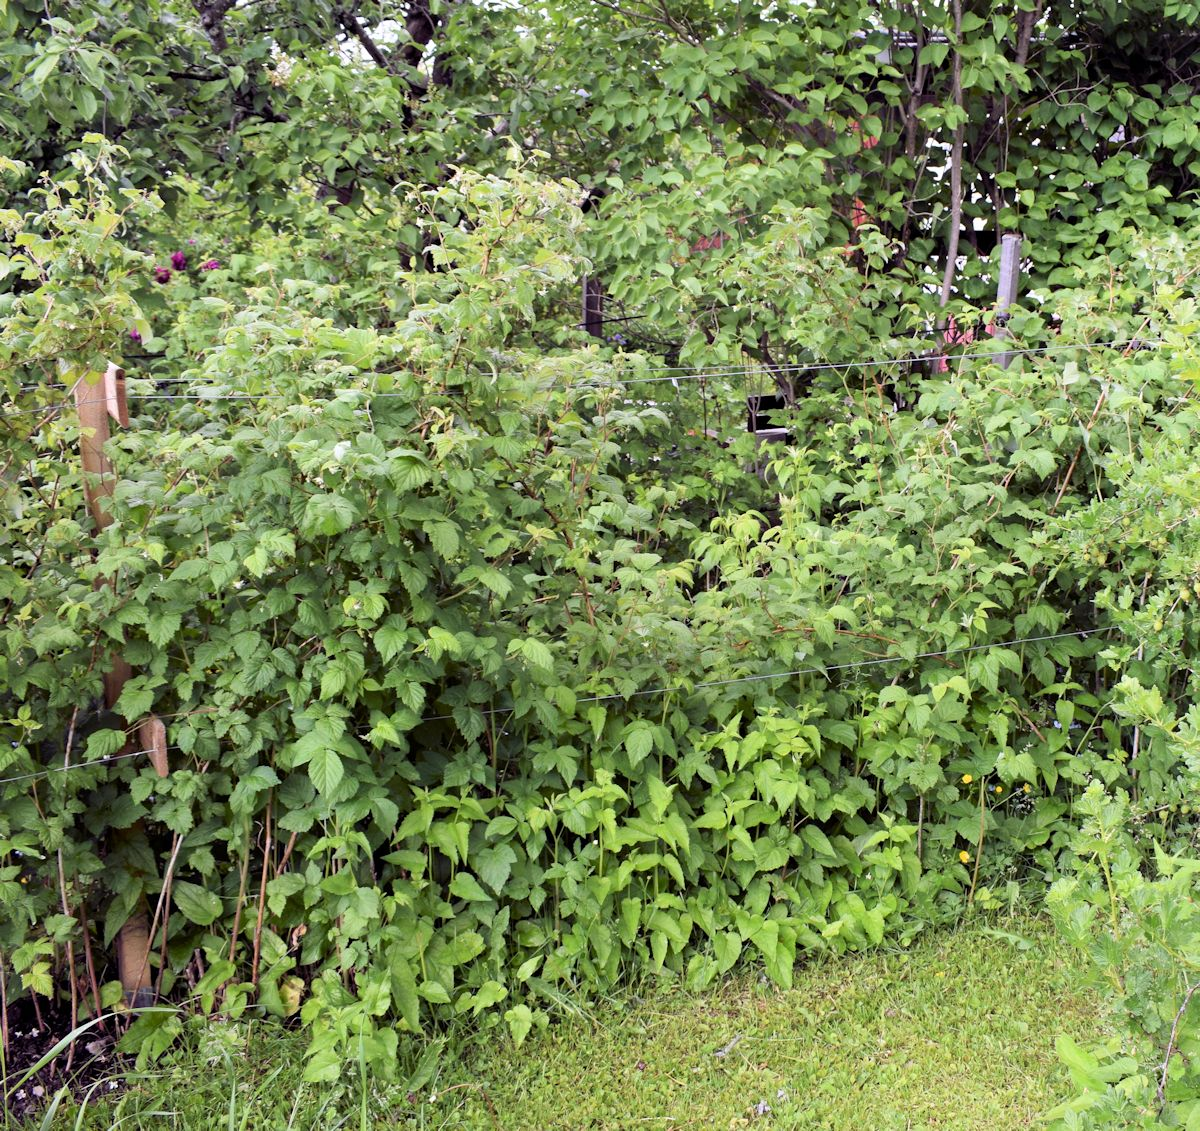 Rikkaruohot vadelmapensaan juurella.